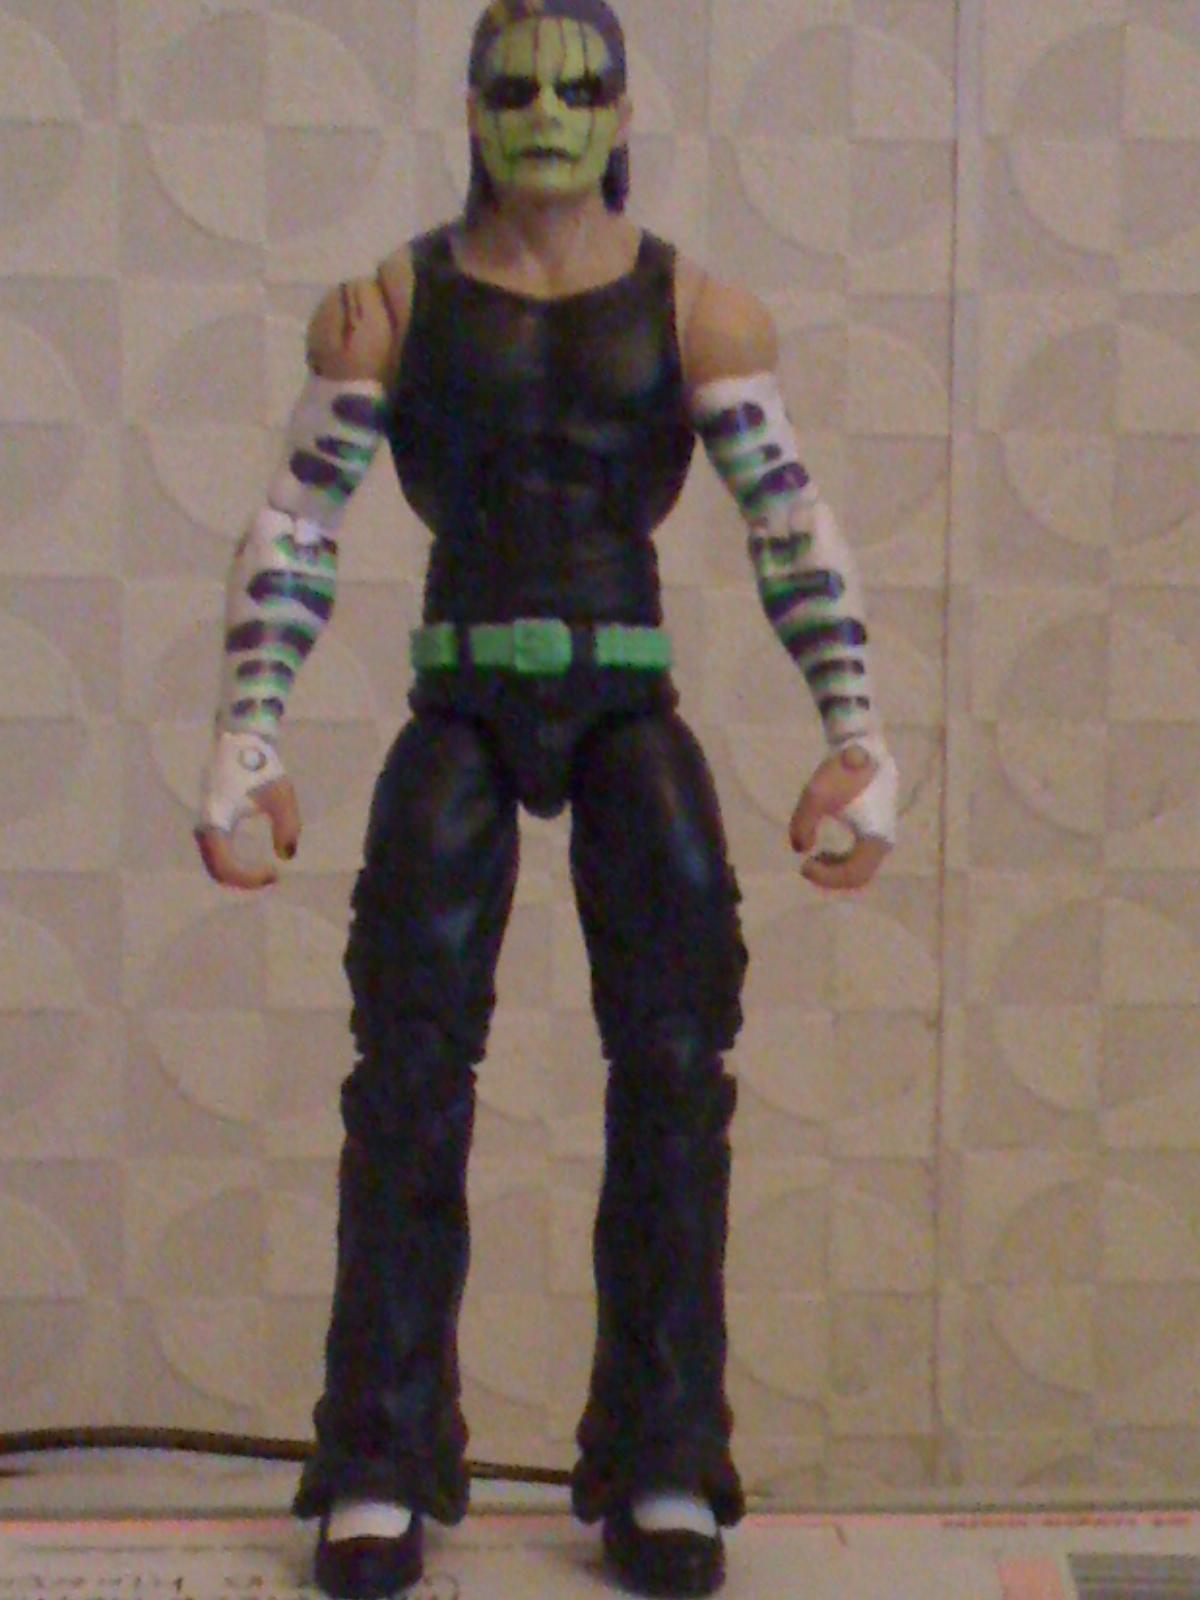 Action Figure Spotlight - Unreleased Mattel Jeff Hardy Figure And More IMG_1241